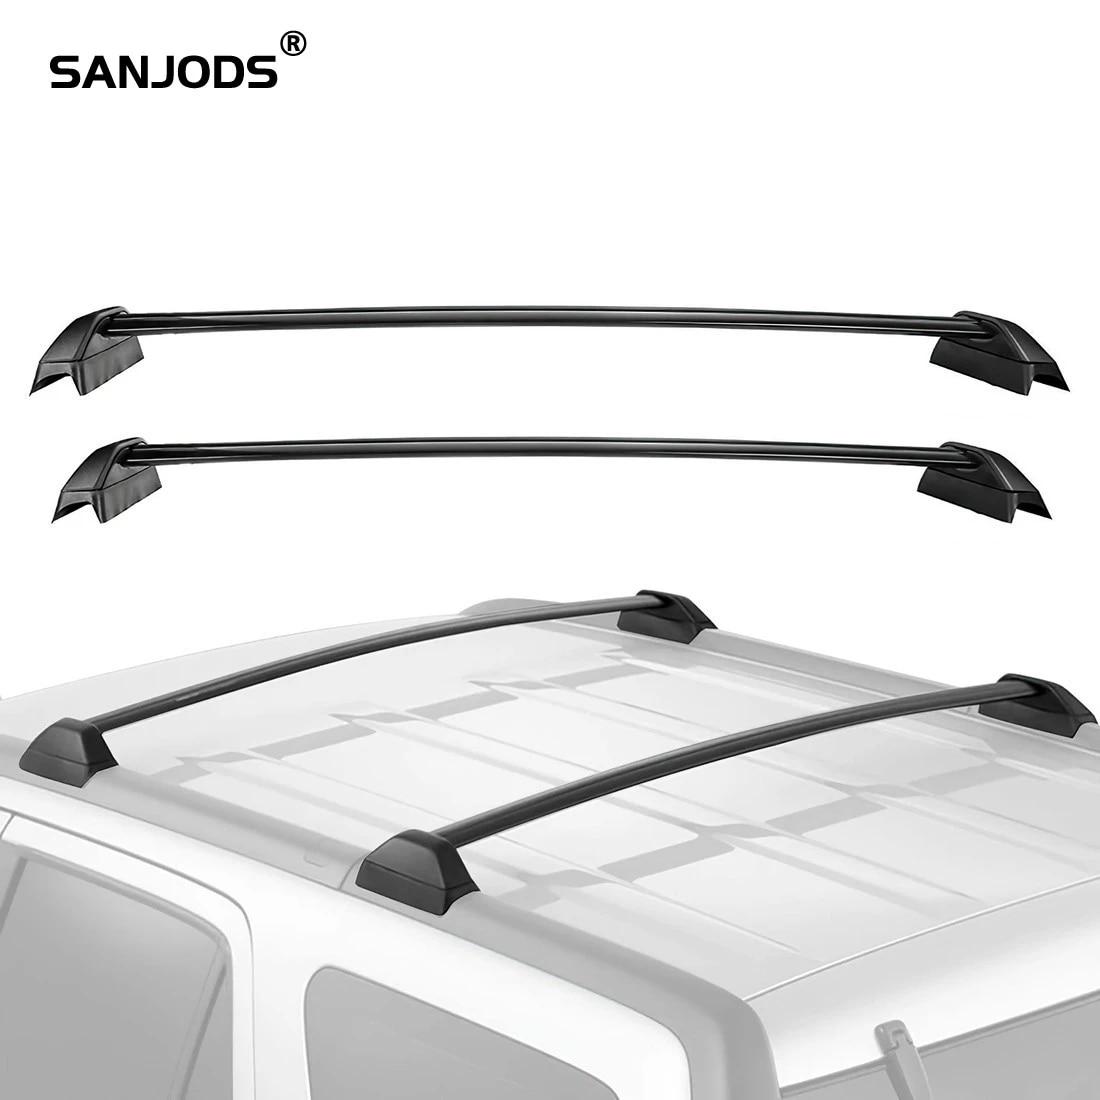 sanjods roof rack cross bar replacement for honda crv 2002 2003 2004 2005 2006 aluminum bolton top rail roof rack cargo carrier